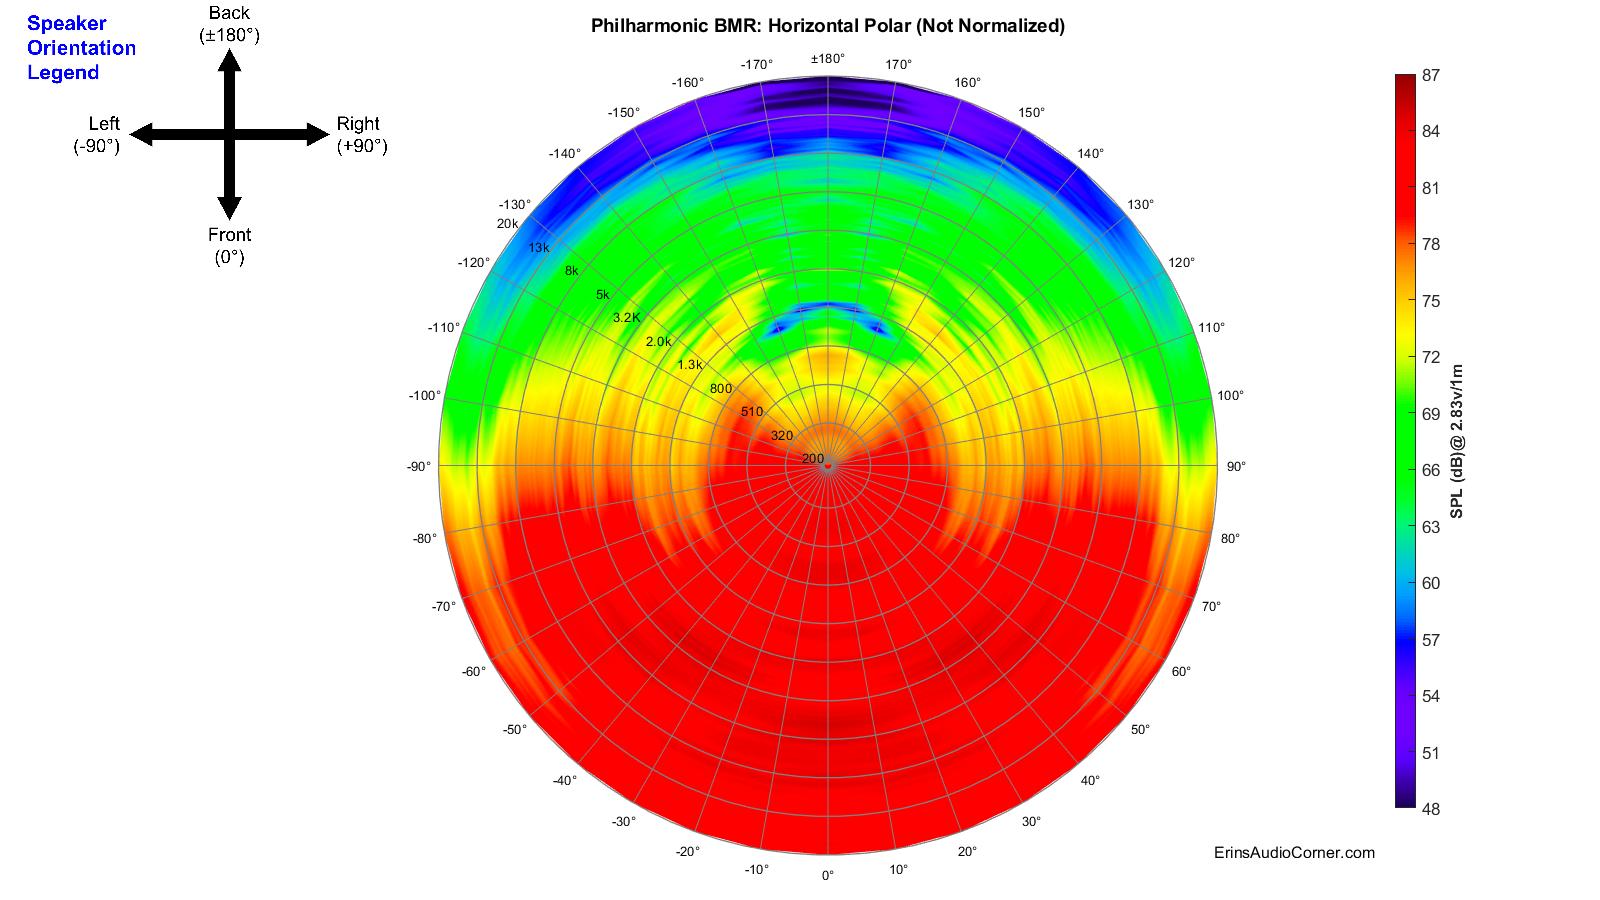 Philharmonic%20BMR_360_Horizontal_Polar.png